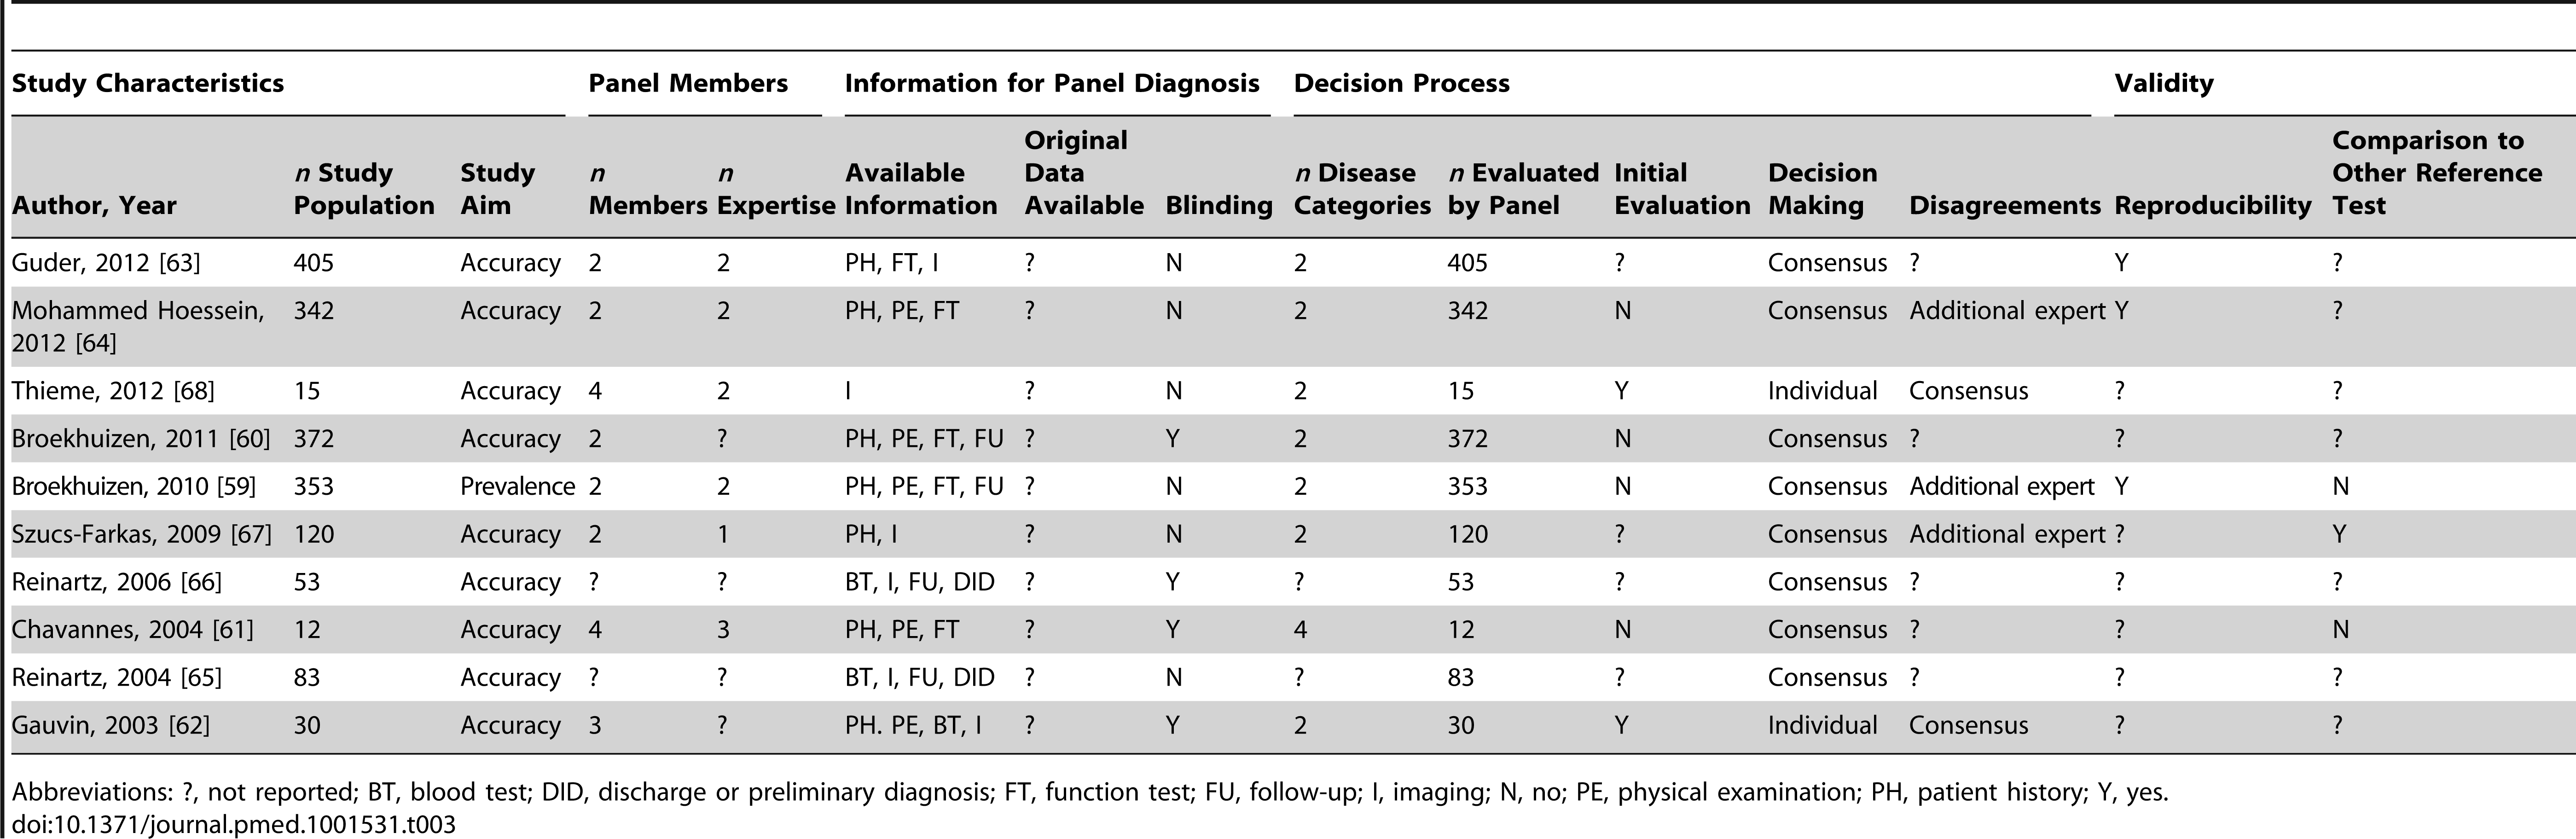 Study characteristics of articles assessing respiratory disorders, <i>n</i>=10.